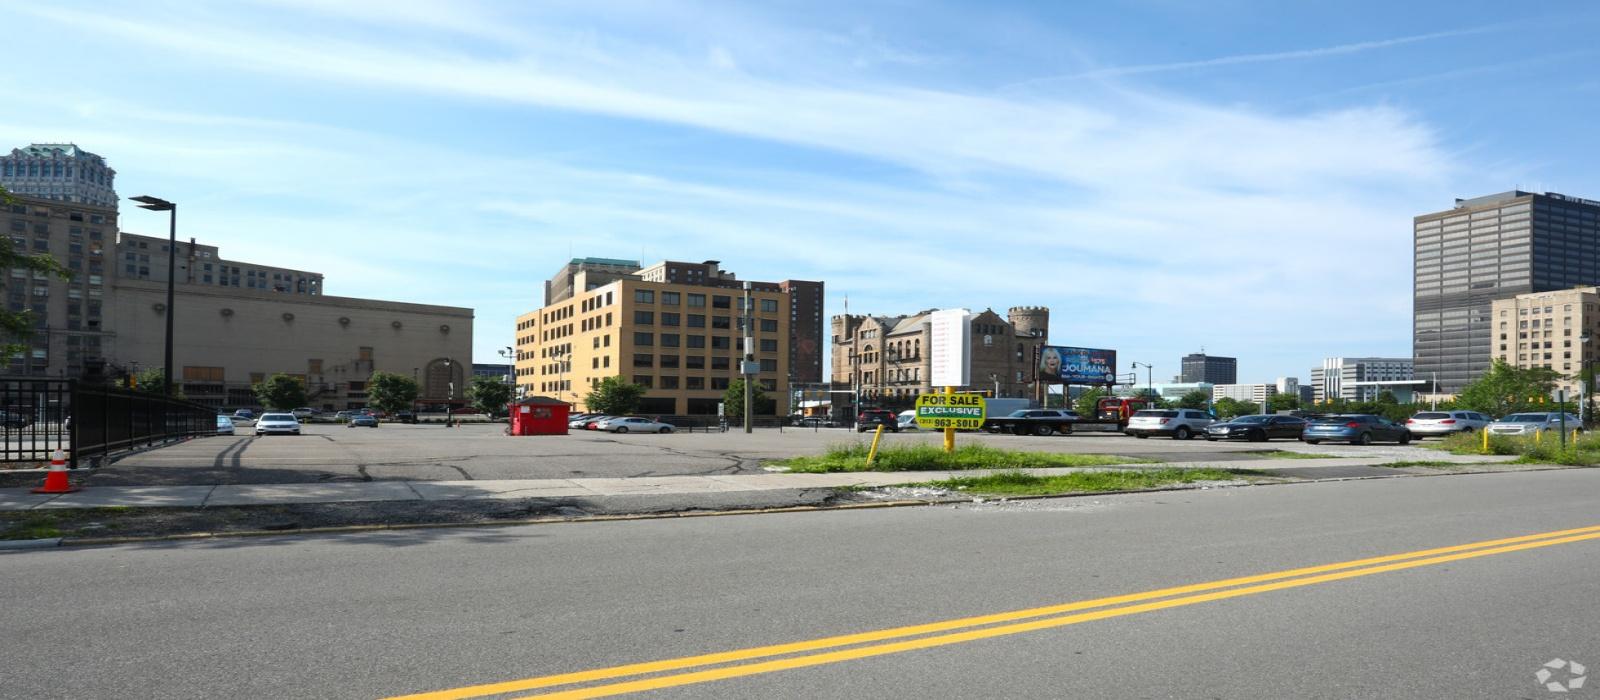 245 West Elizabeth, Detroit, Michigan 48201, ,Office,For Sale,245 West Elizabeth,1011